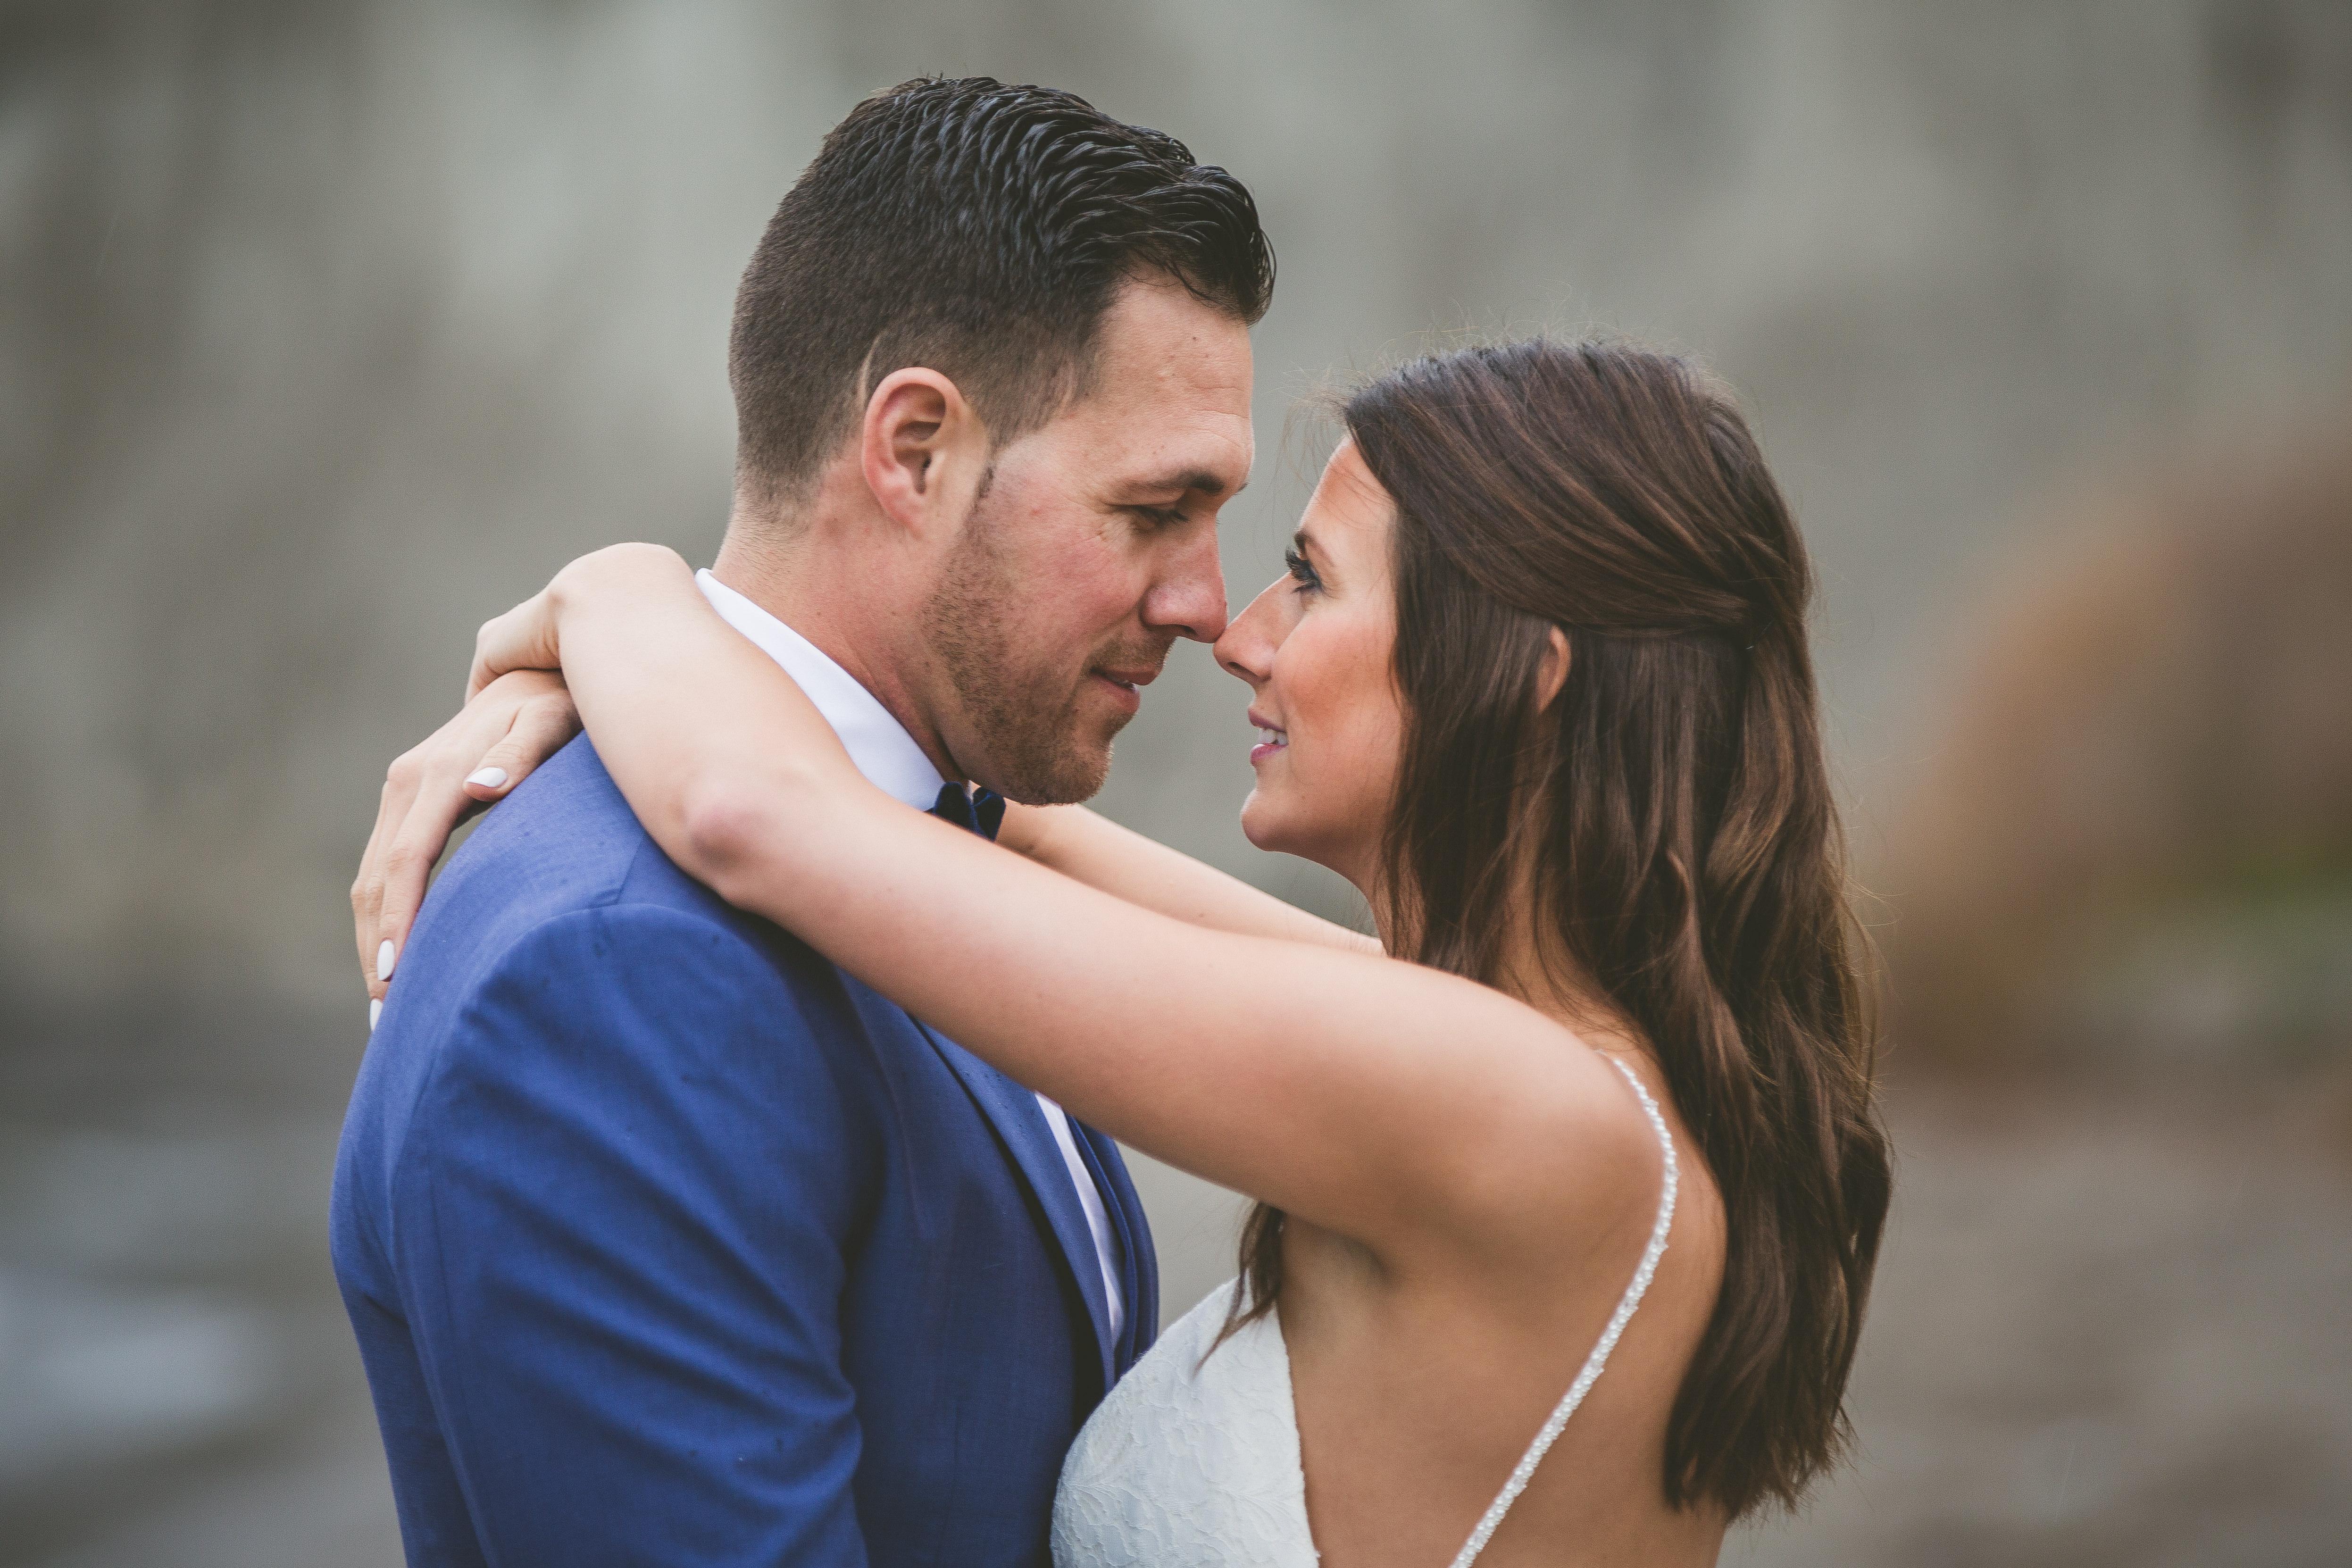 scarborough bluffs wedding photos 36 - Scarborough Bluffs Wedding Photos